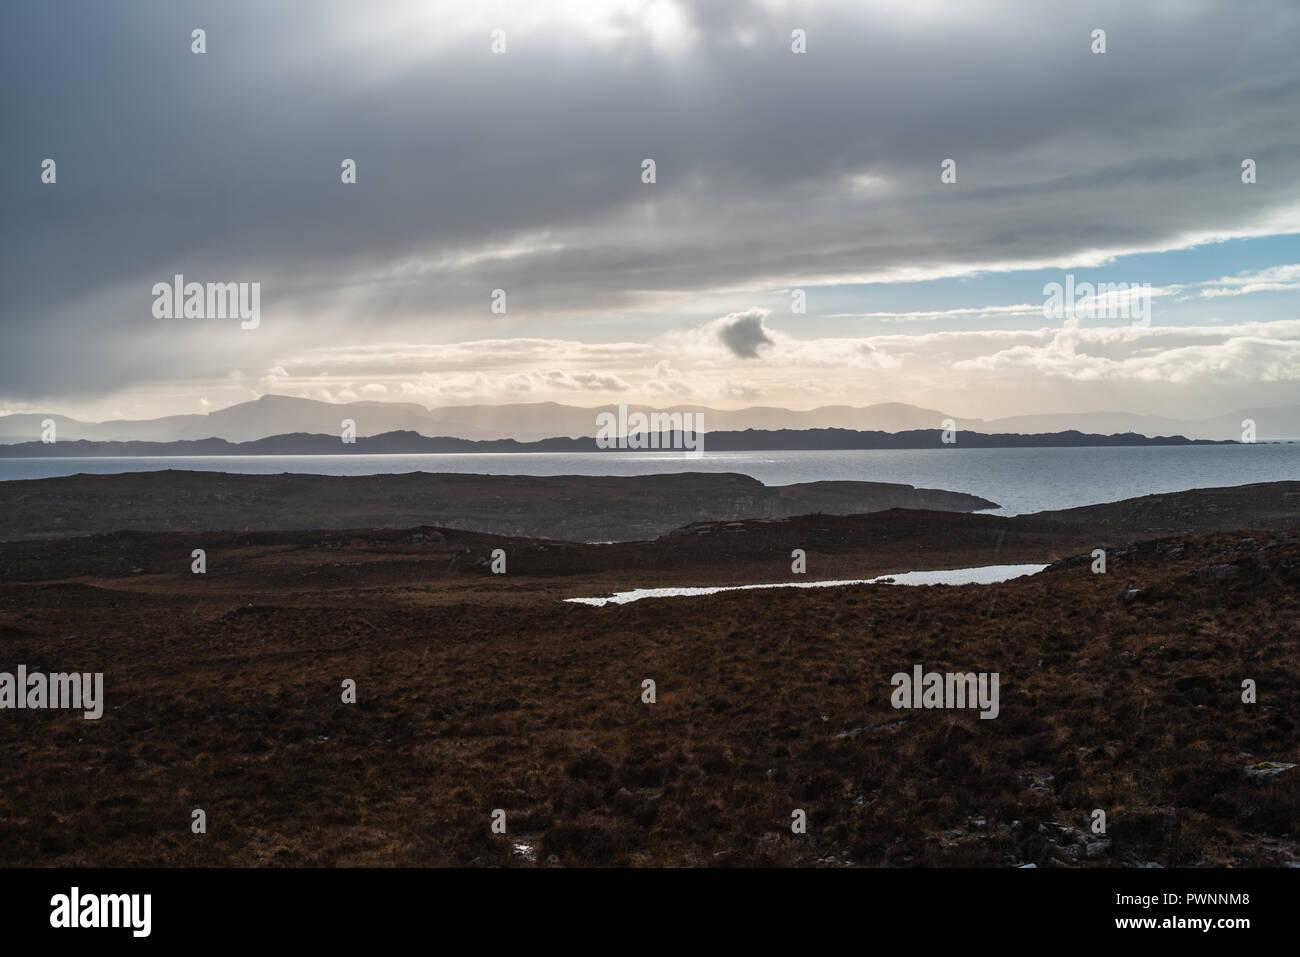 View onto the Isle of Skye from the Applecross Peninsula, Western Highlands, Scotland, Uk Stock Photo